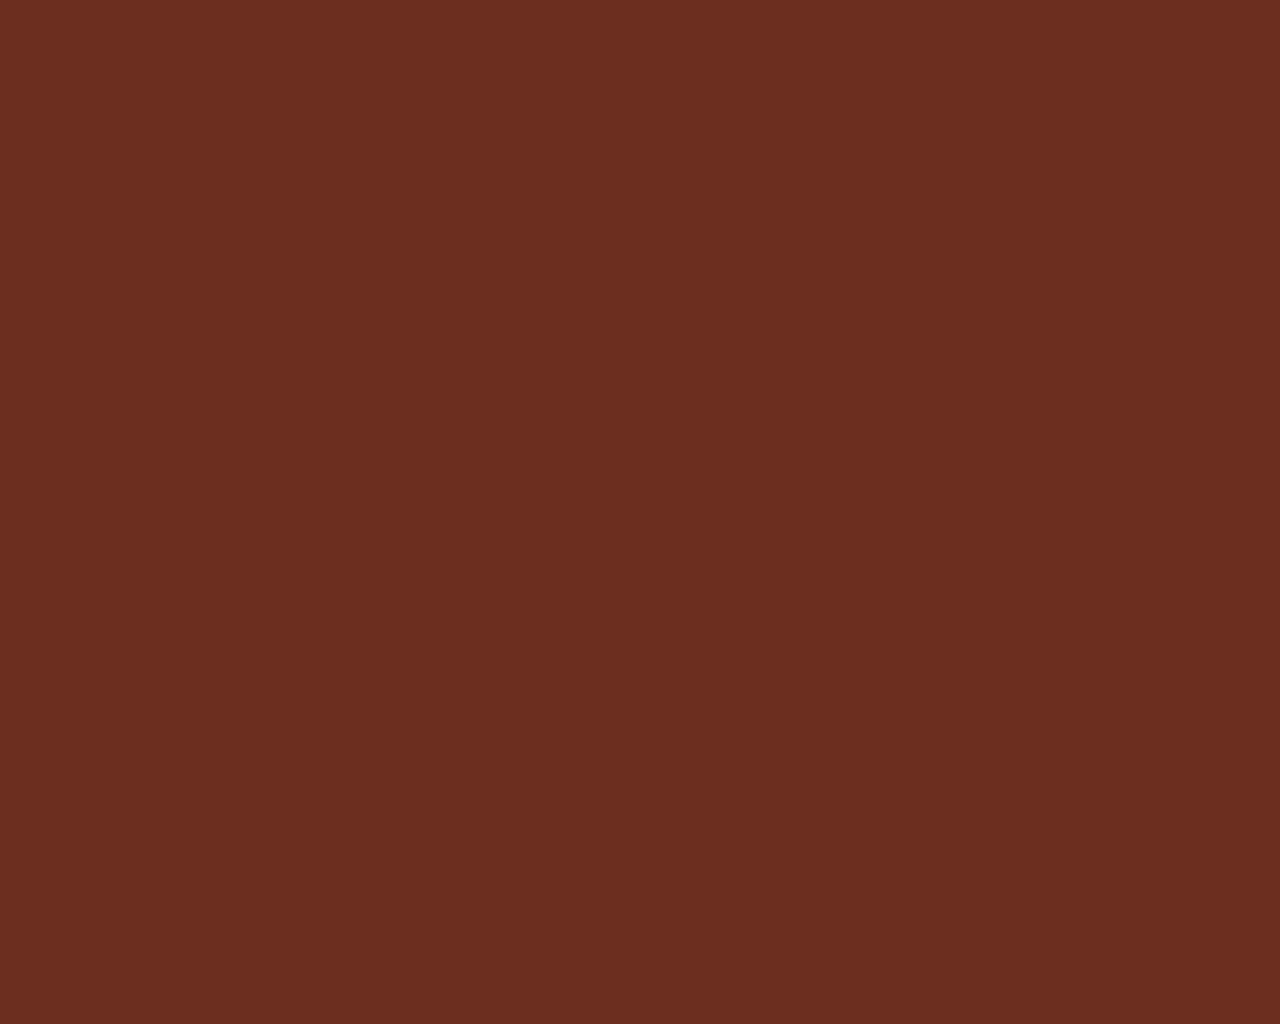 1280x1024 Liver Organ Solid Color Background